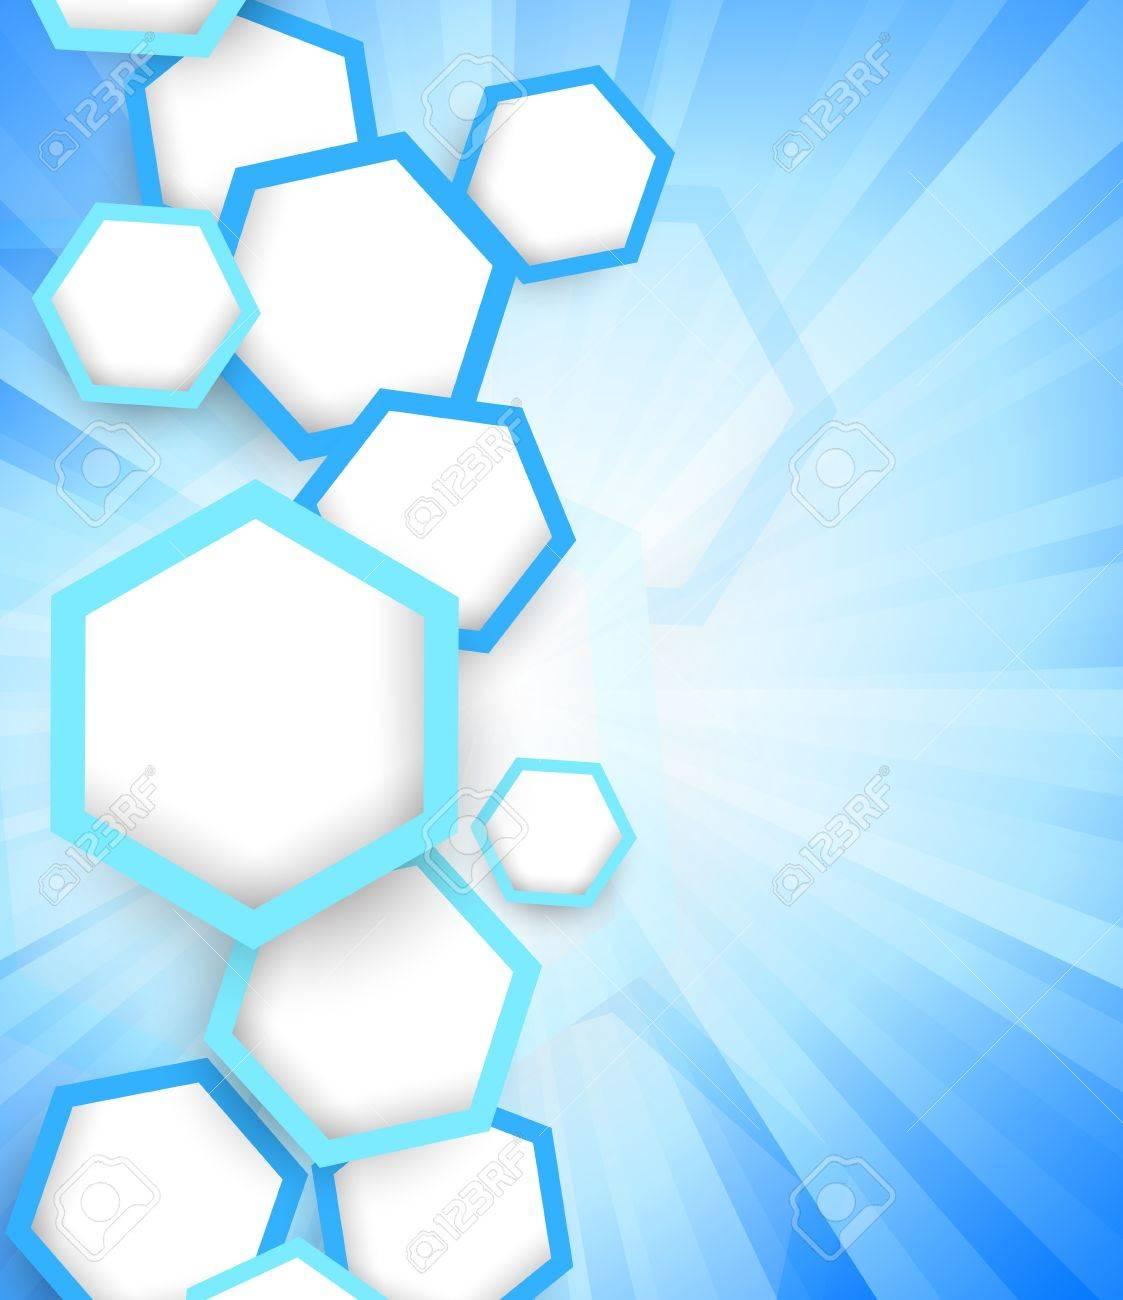 https://previews.123rf.com/images/denchik/denchik1209/denchik120900269/15472754-bright-background-with-blue-hexagons-abstract-illustration.jpg